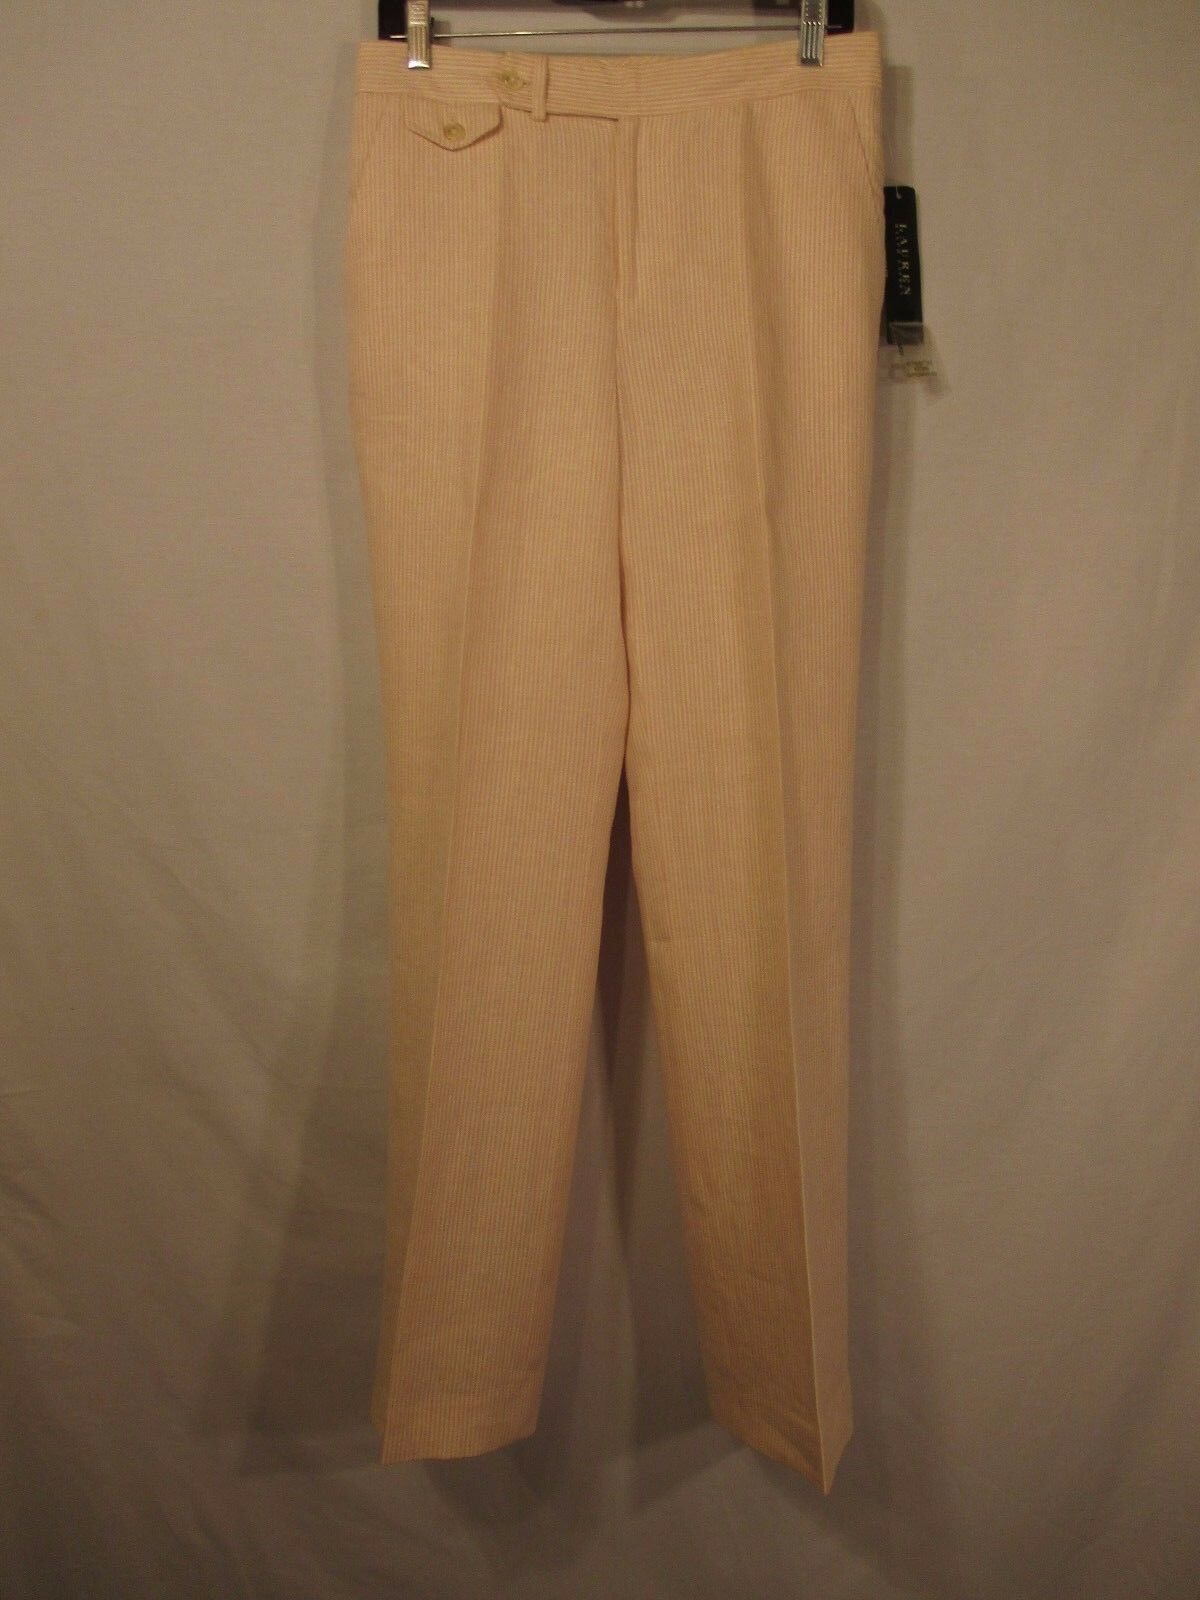 LAUREN RALPH LAUREN Pink & White Striped 100% Linen Lined Pants - Size 6 - NWT